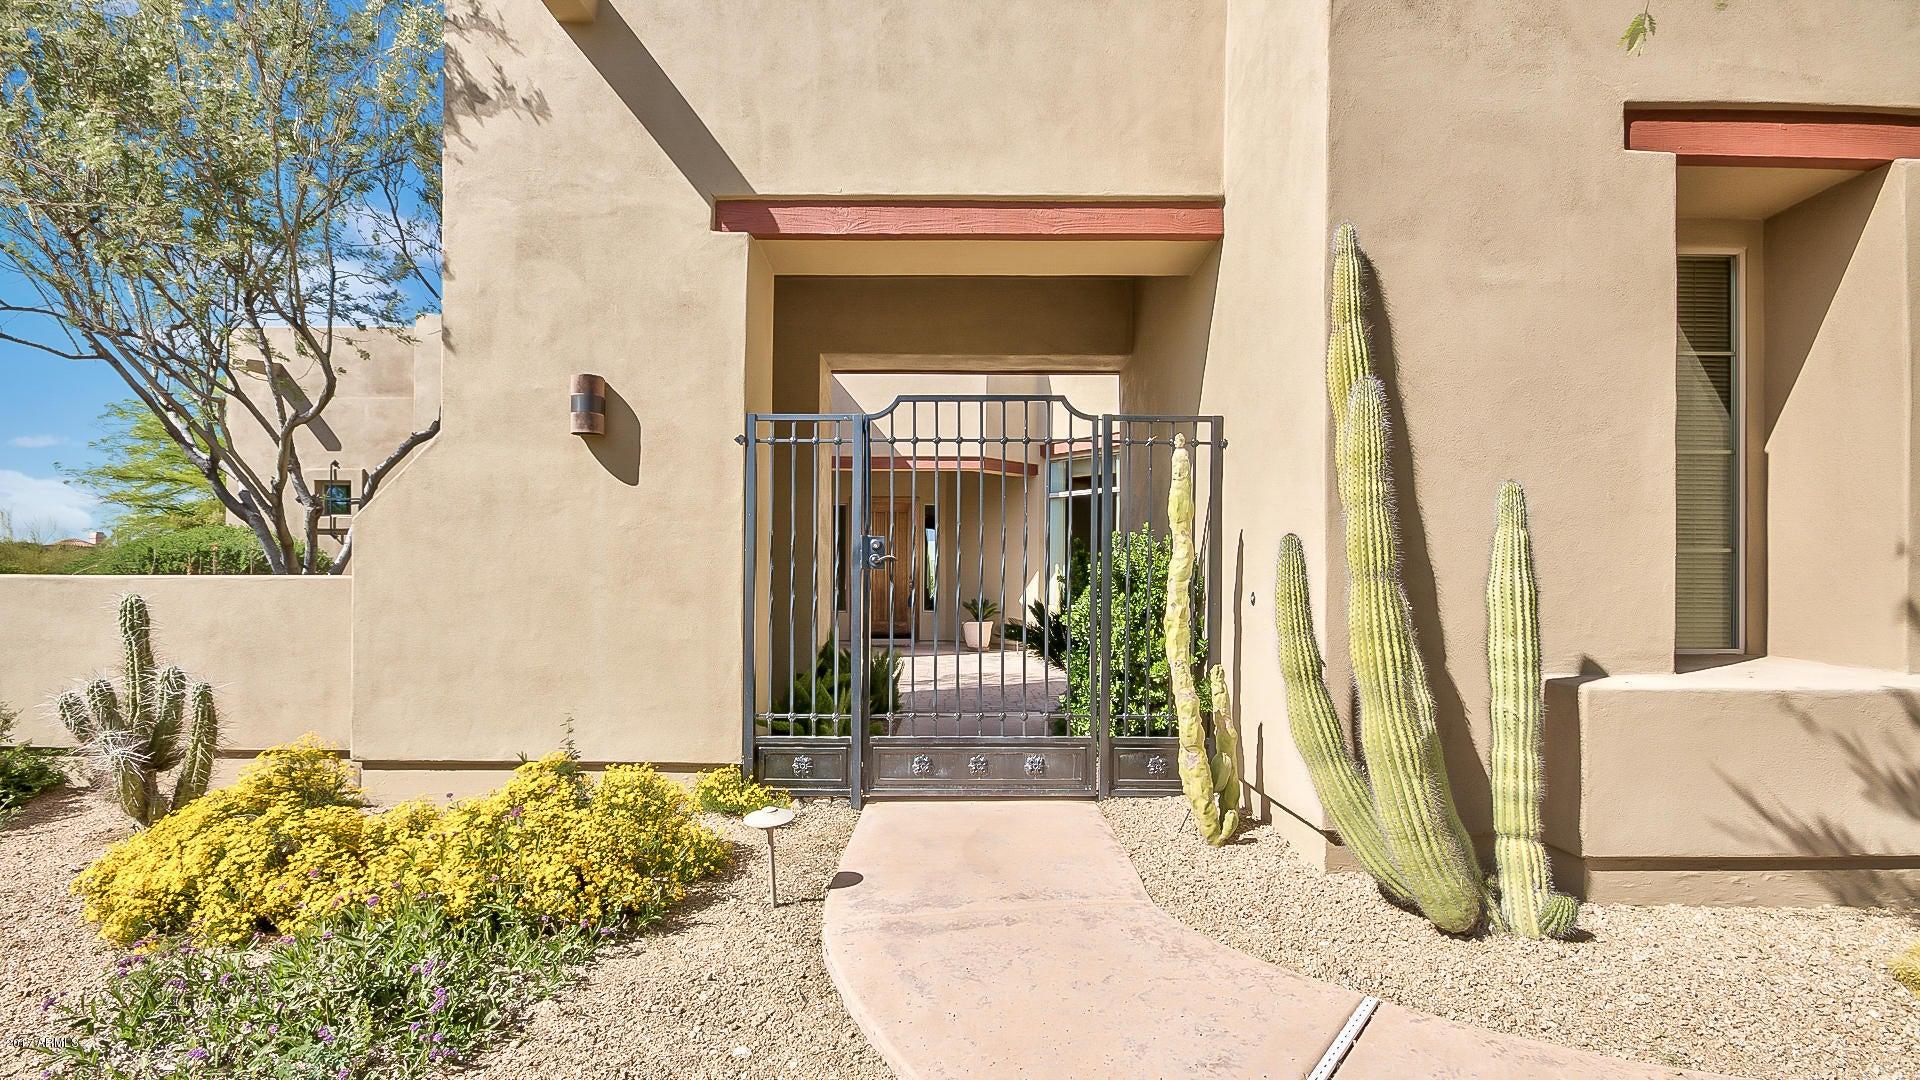 8310 E NIGHTINGALE STAR Drive Scottsdale, AZ 85266 - MLS #: 5661549